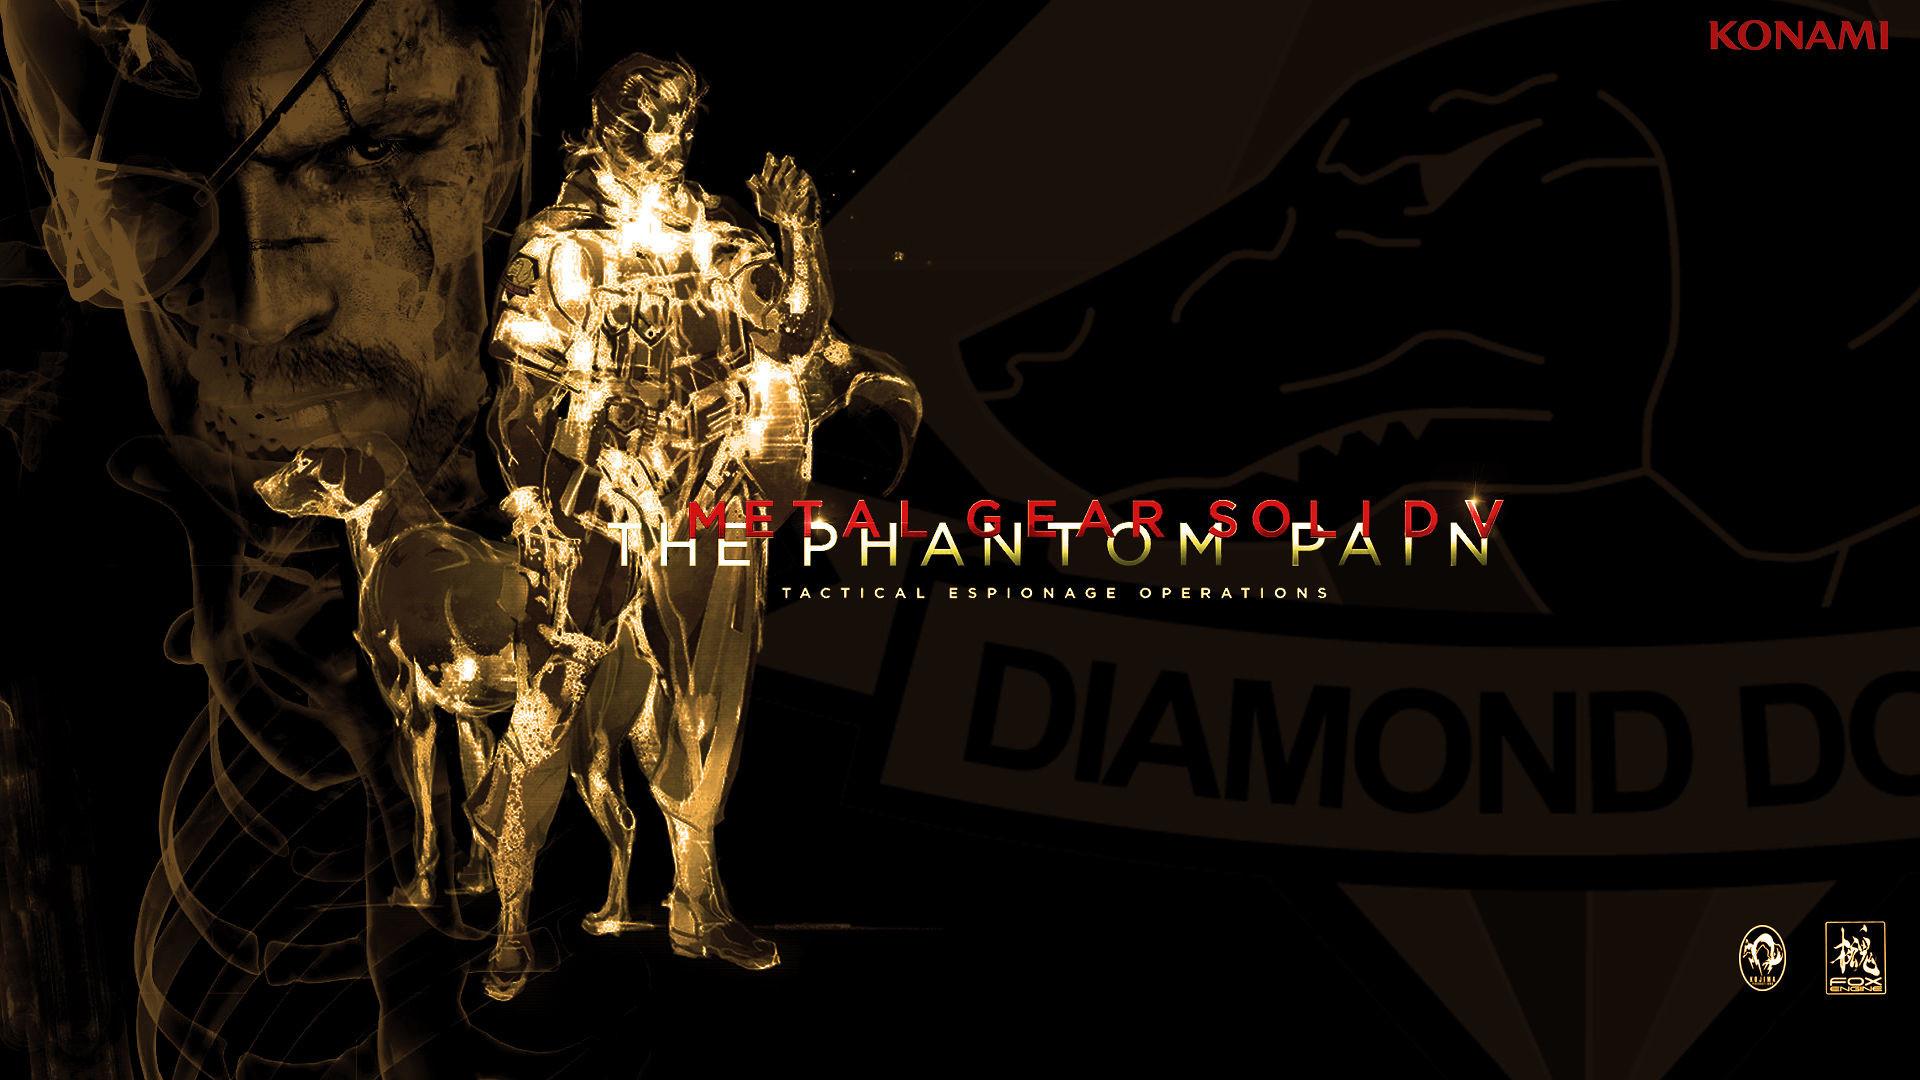 Metal Gear Solid 5: The Phantom Pain to Affect Kojima's Silent Hills .